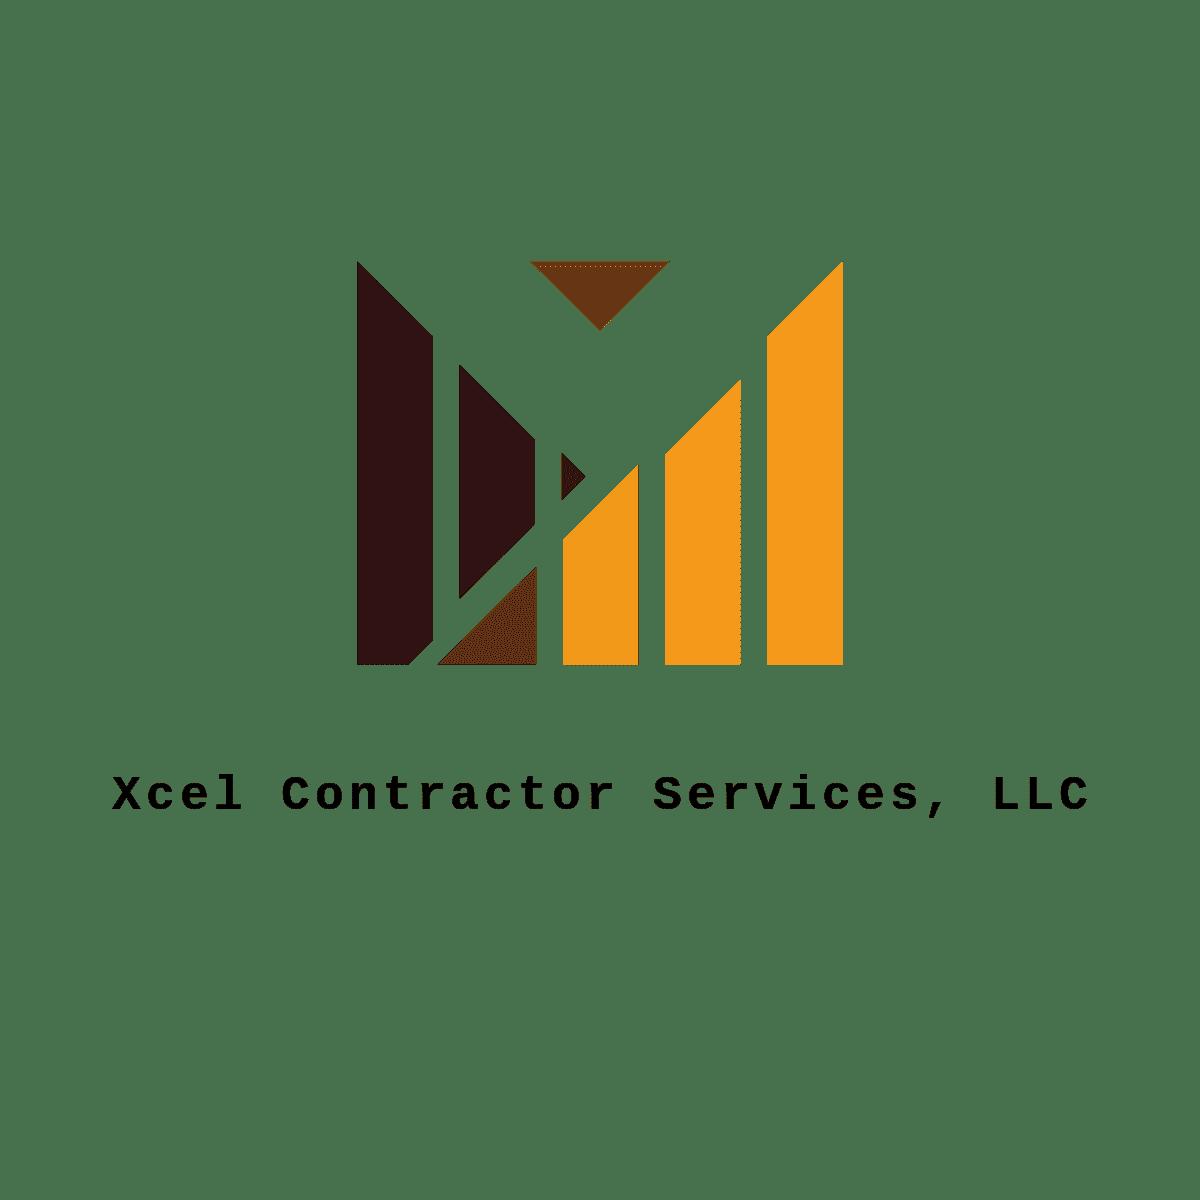 Xcel Contractor Services